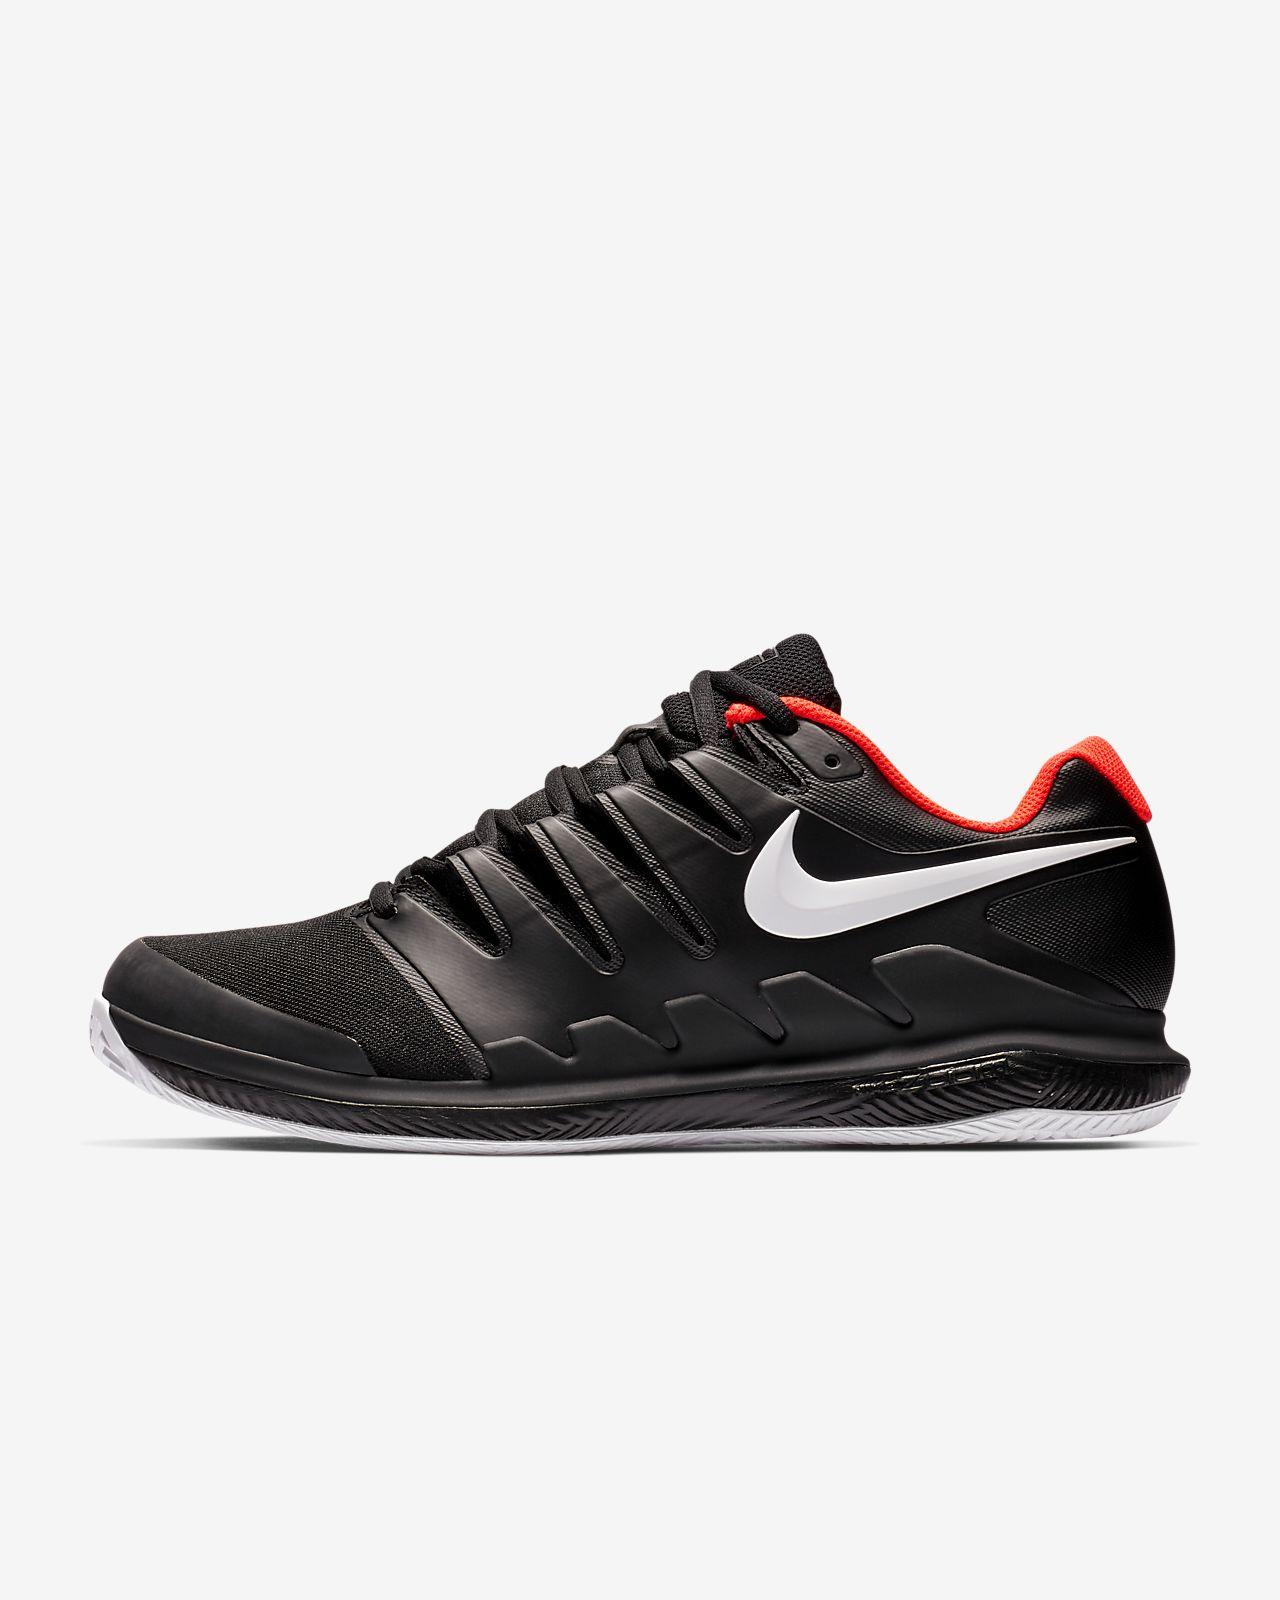 ab890f0c37f54 Scarpa da tennis Nike Air Zoom Vapor X Clay - Uomo. Nike.com CH